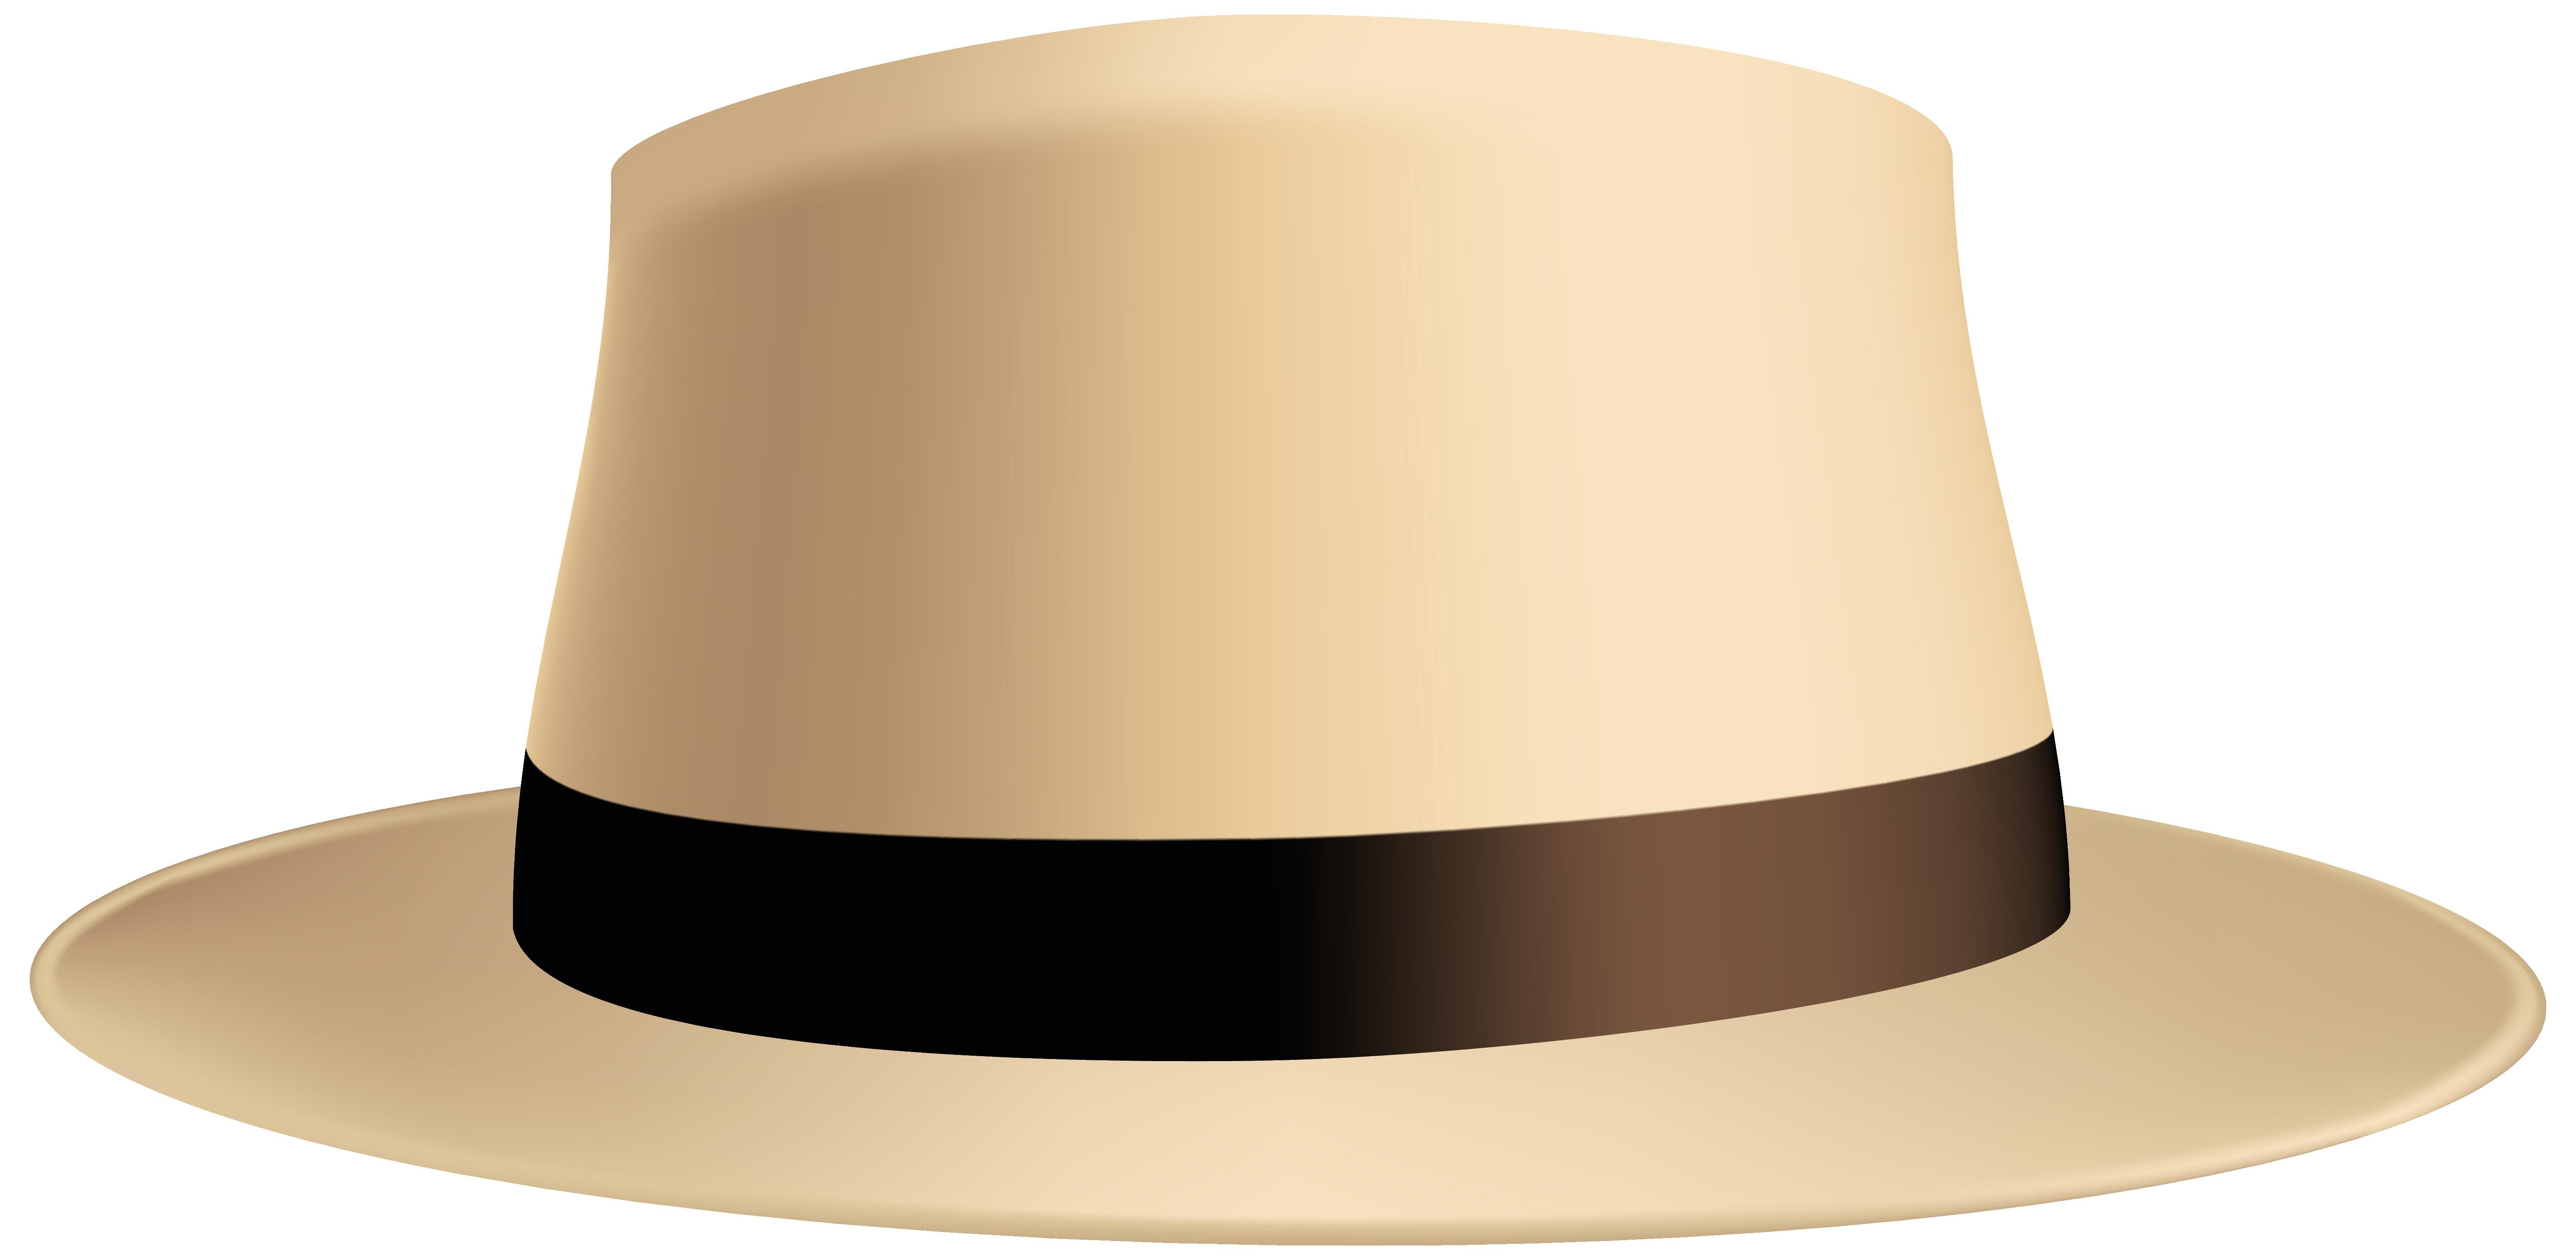 Clipart summer hat. Male png clip art